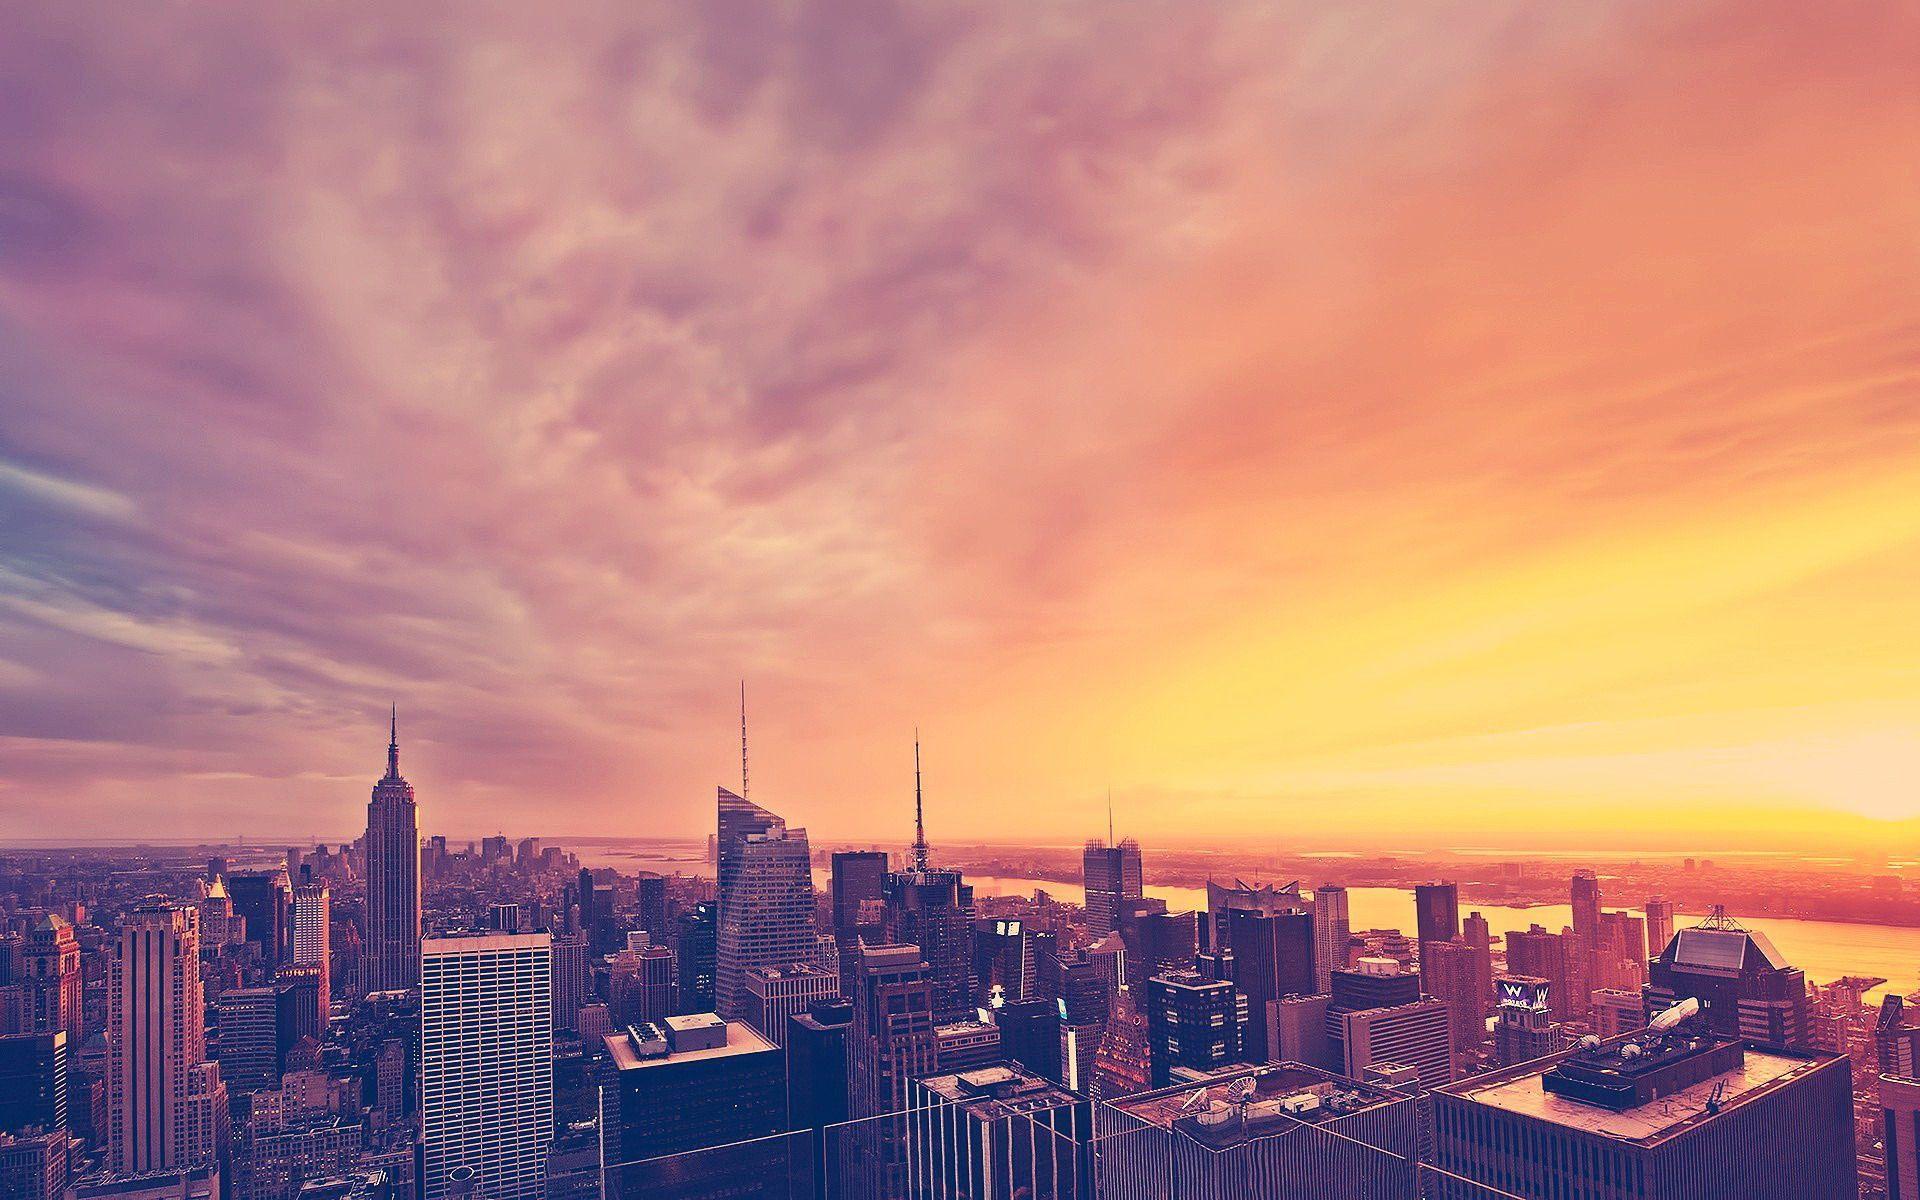 city sunset wallpaper 7106 - photo #2